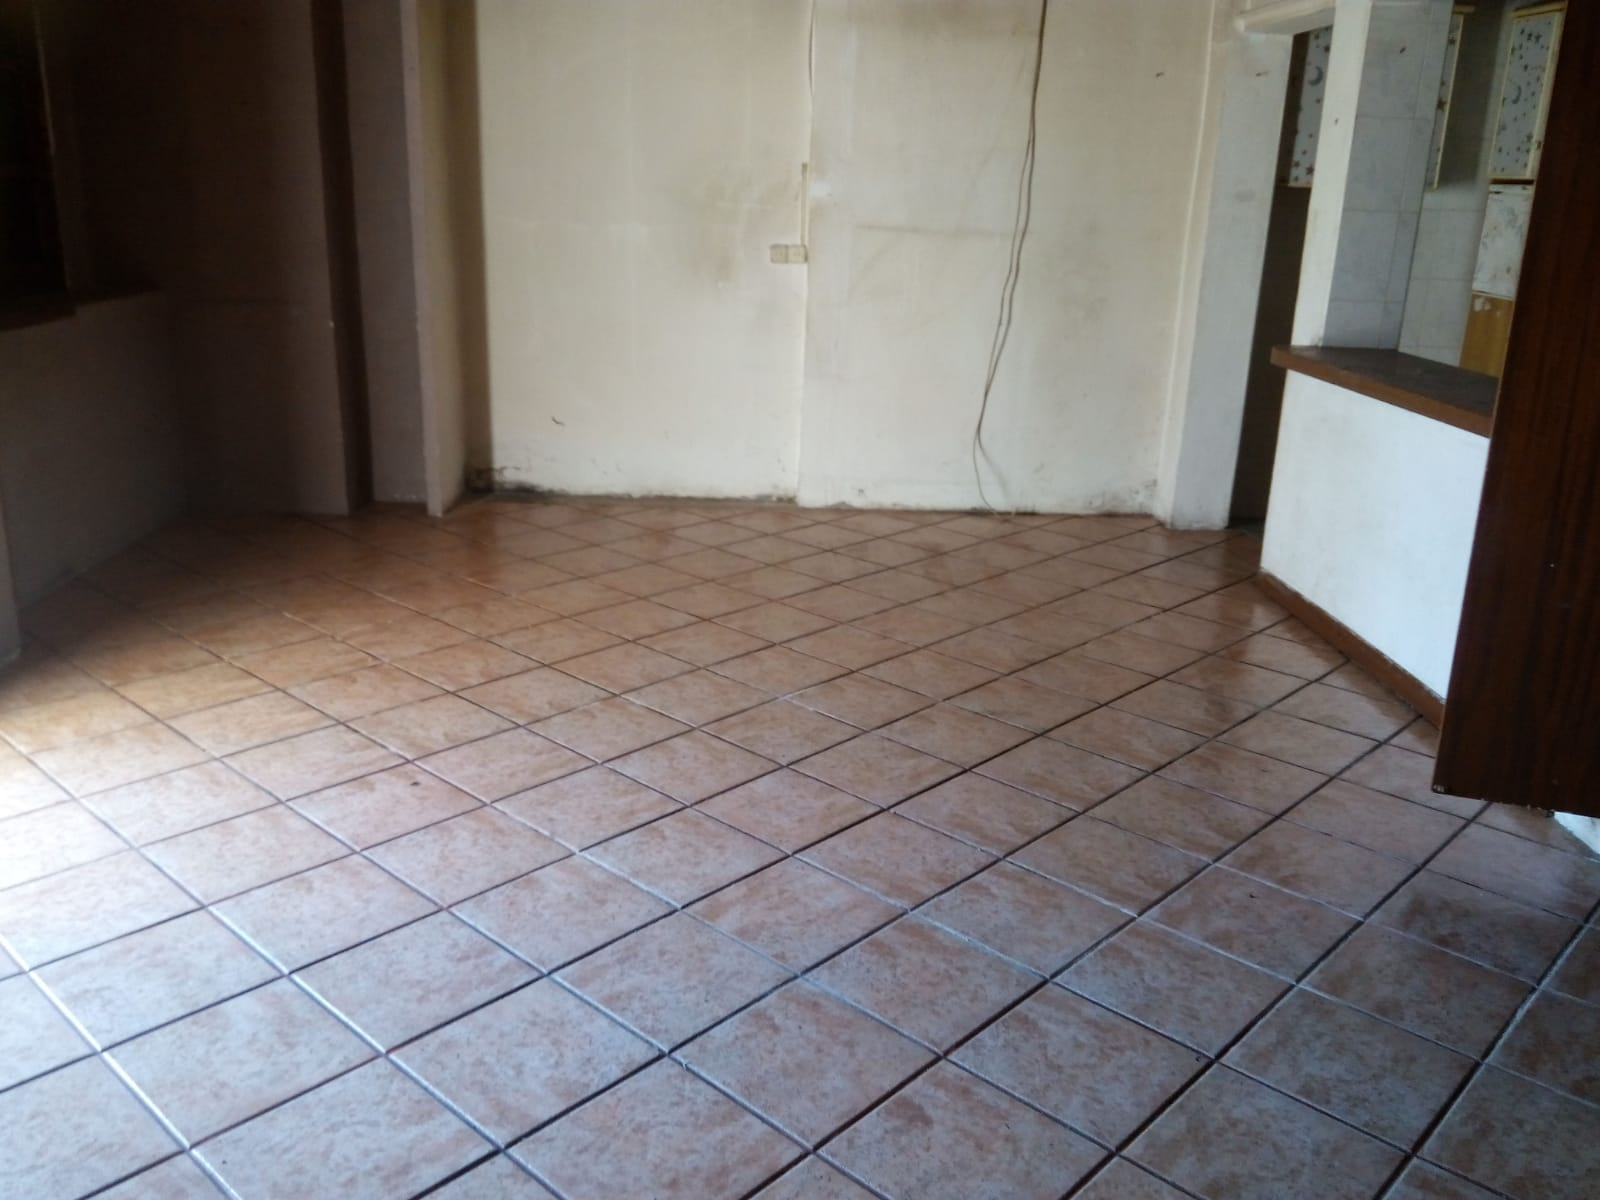 Casa en venta en Brañosera, Palencia, Calle Hermano Bernardo, 44.900 €, 1 habitación, 1 baño, 112 m2